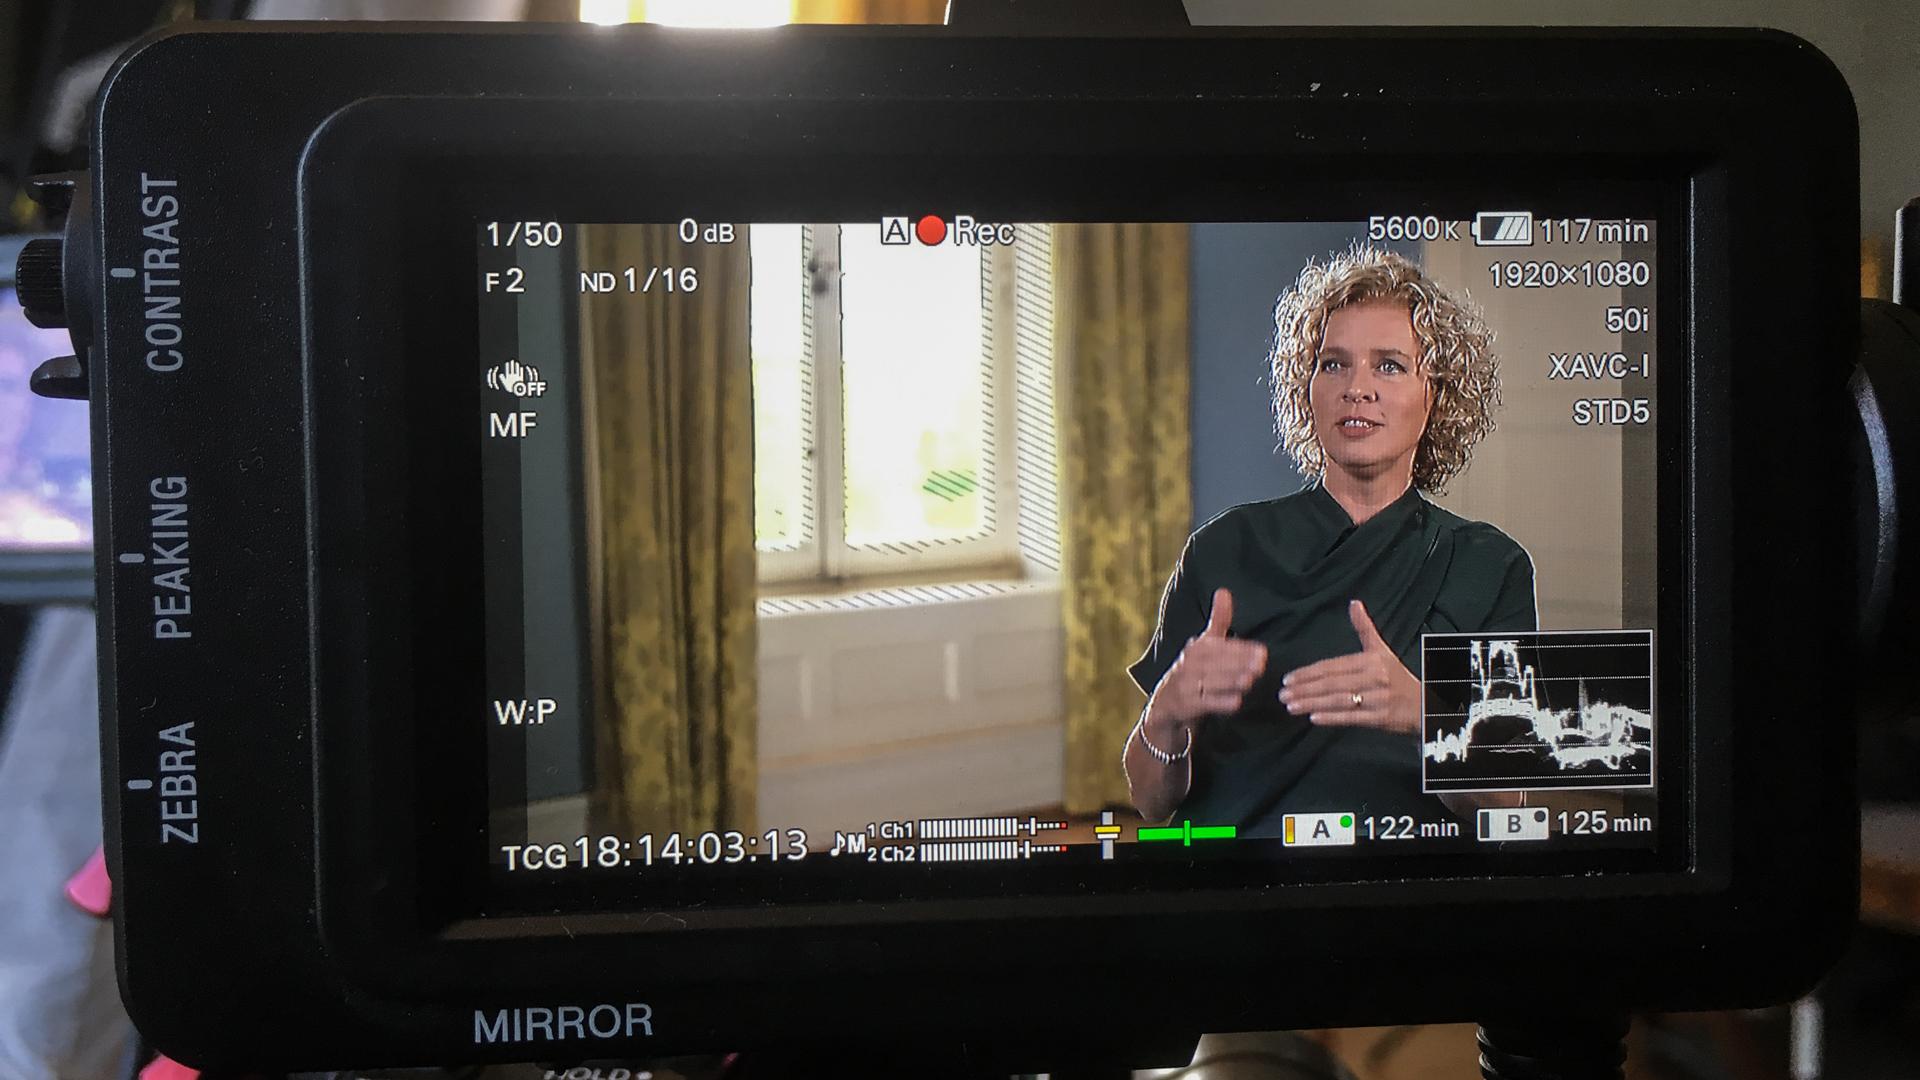 Diana dokumentation for Spiegel tv dokumentation